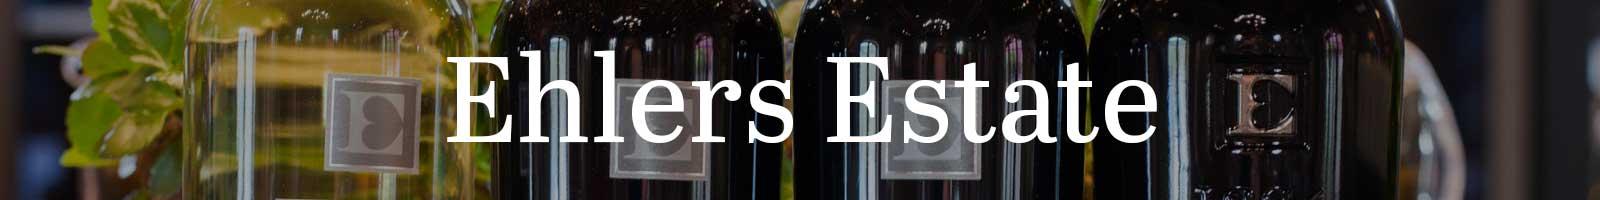 Essential Winemakers of California - Ehlers Estate